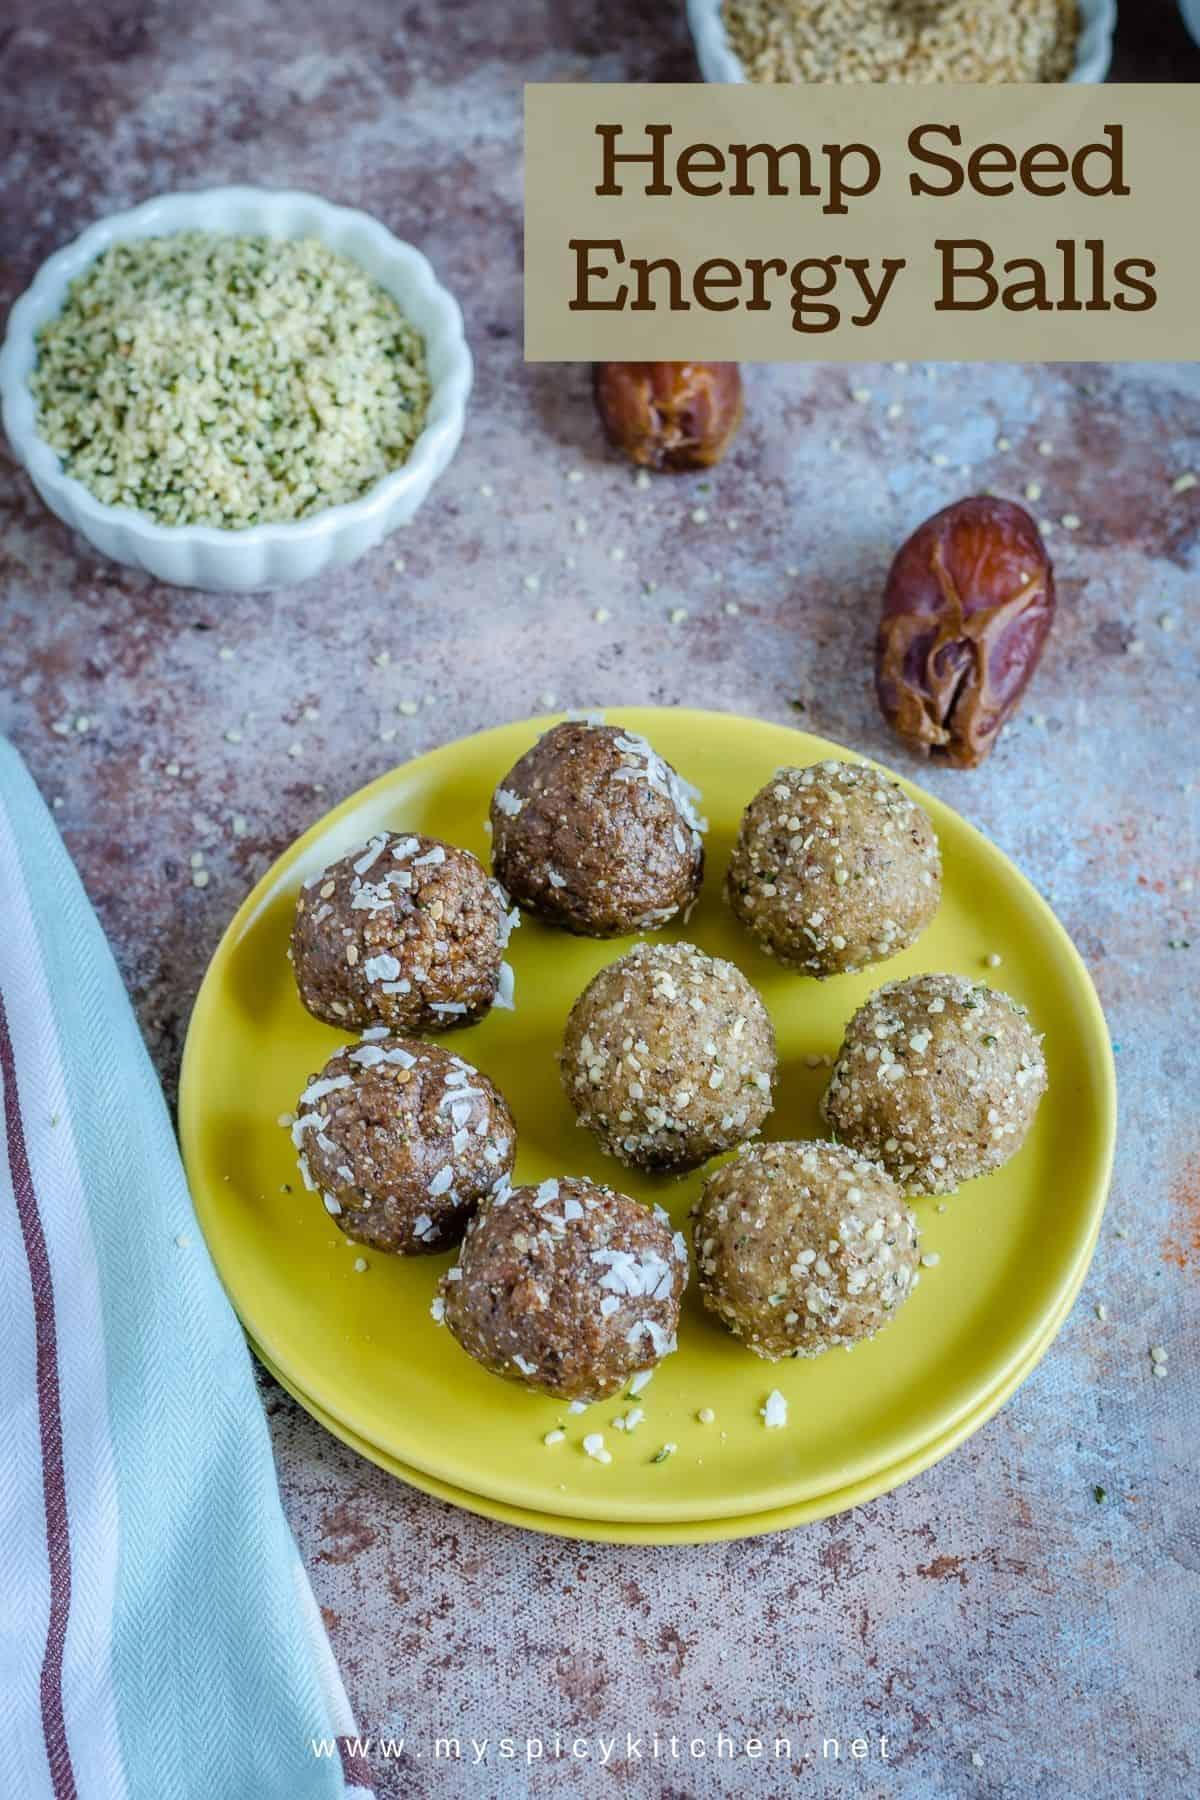 Plate of hemp seeds energy balls.